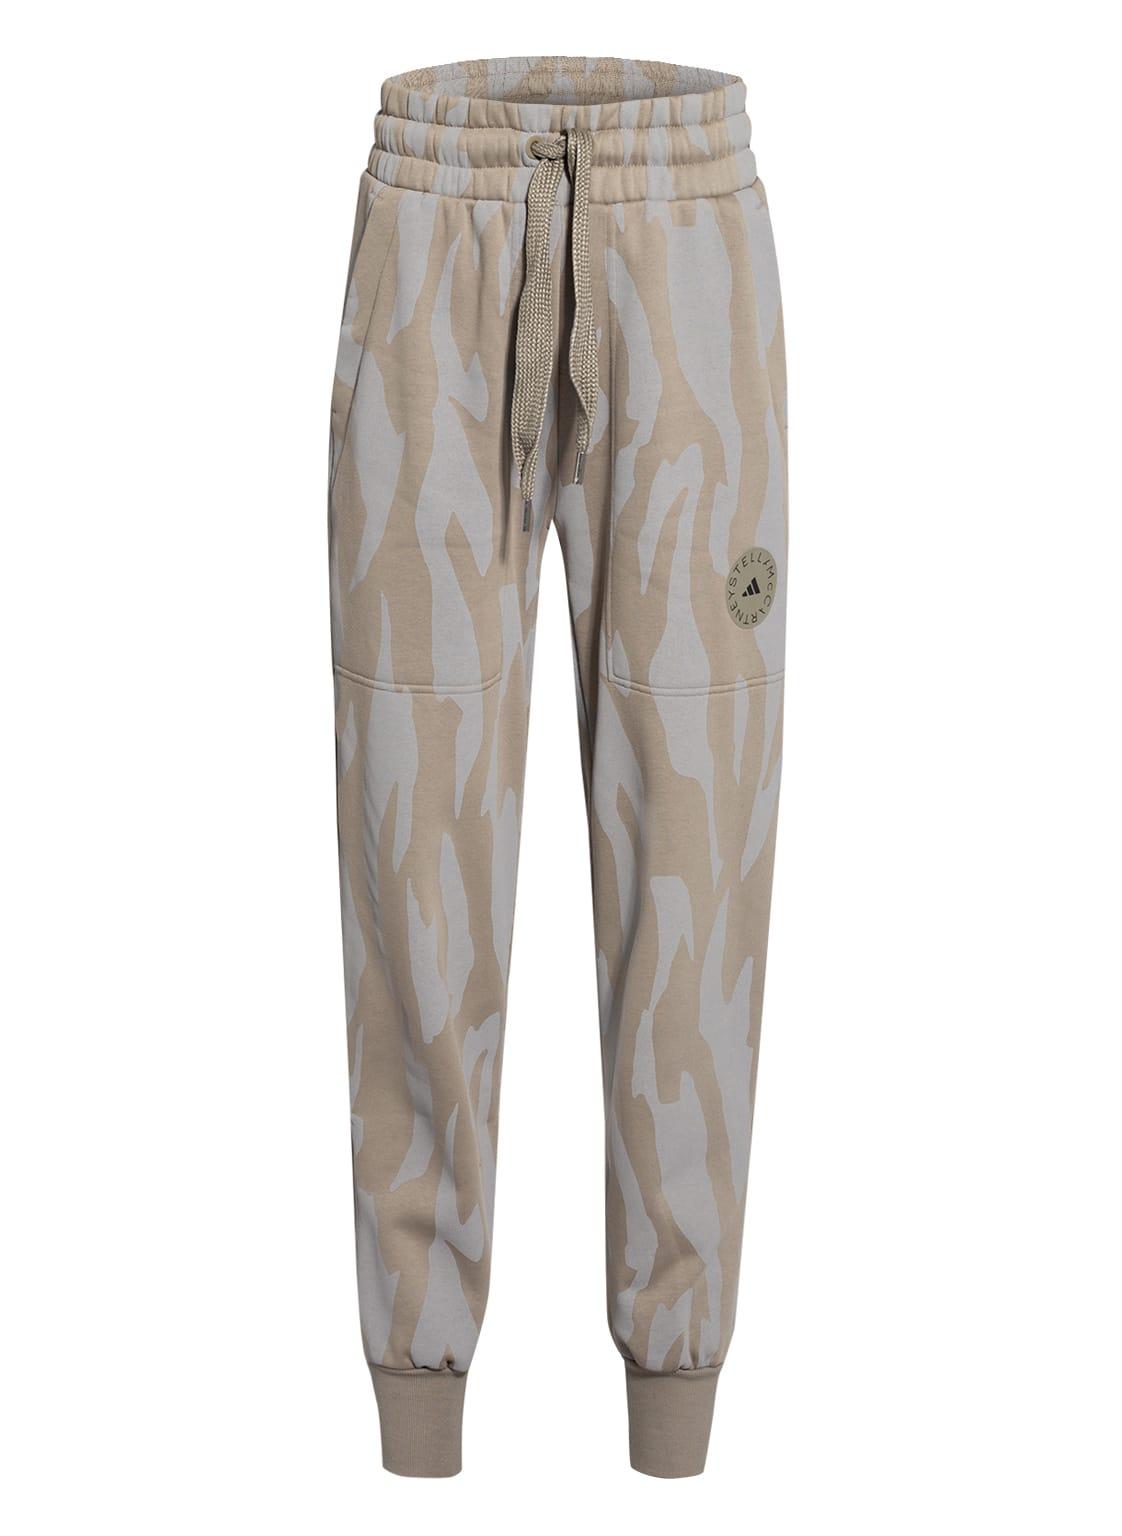 Image of Adidas By Stella Mccartney Sweatpants Sportswear College grau